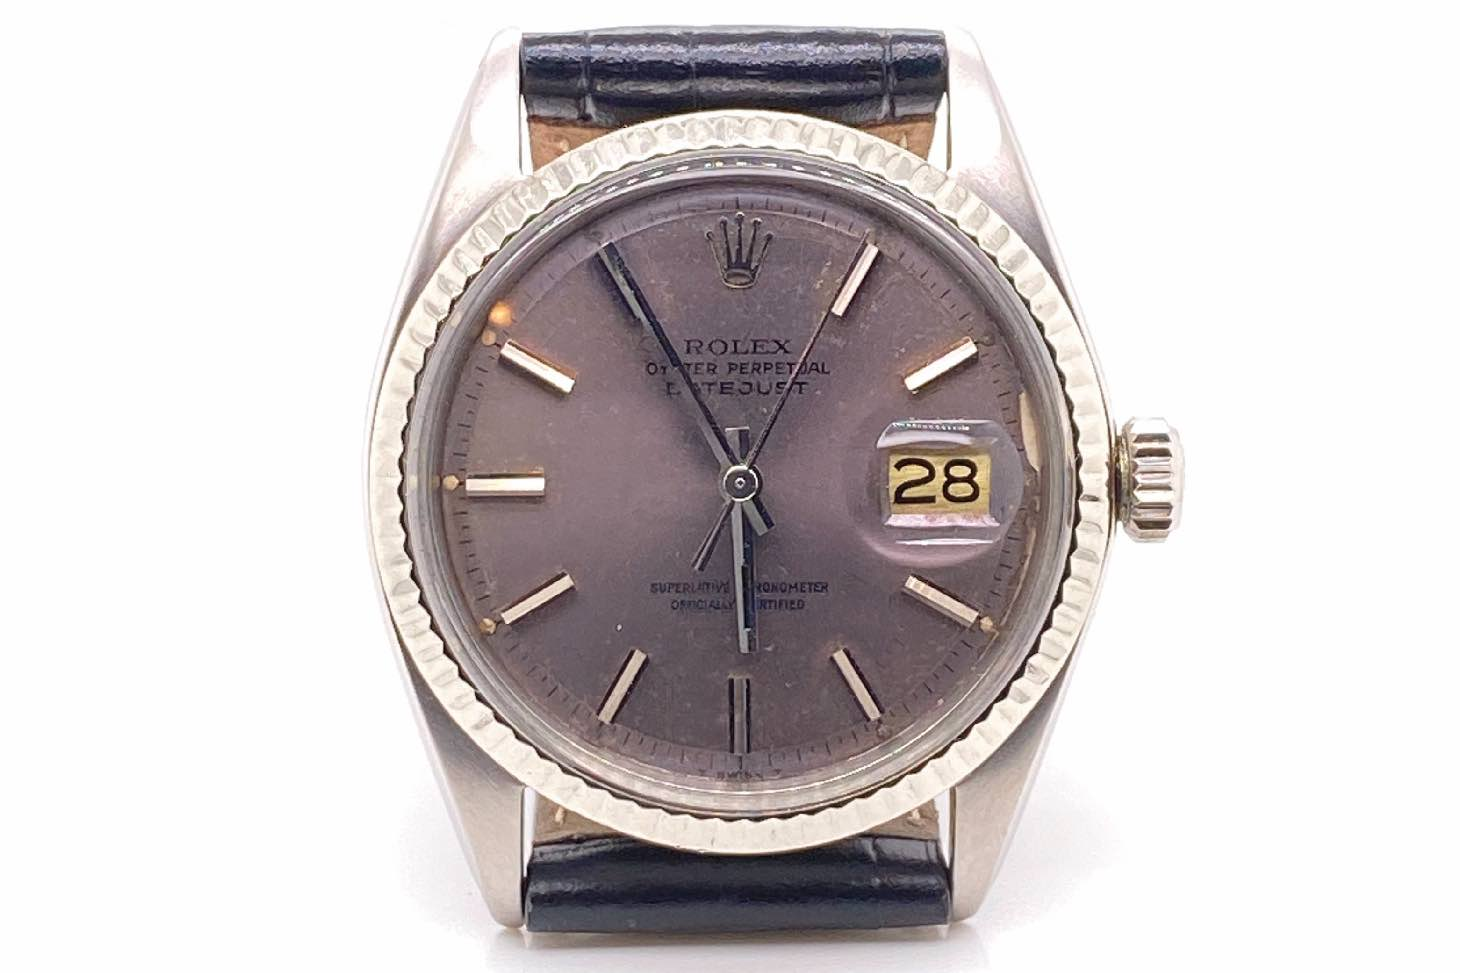 Montre Rolex Oyster, acier cadran gris ref 1601